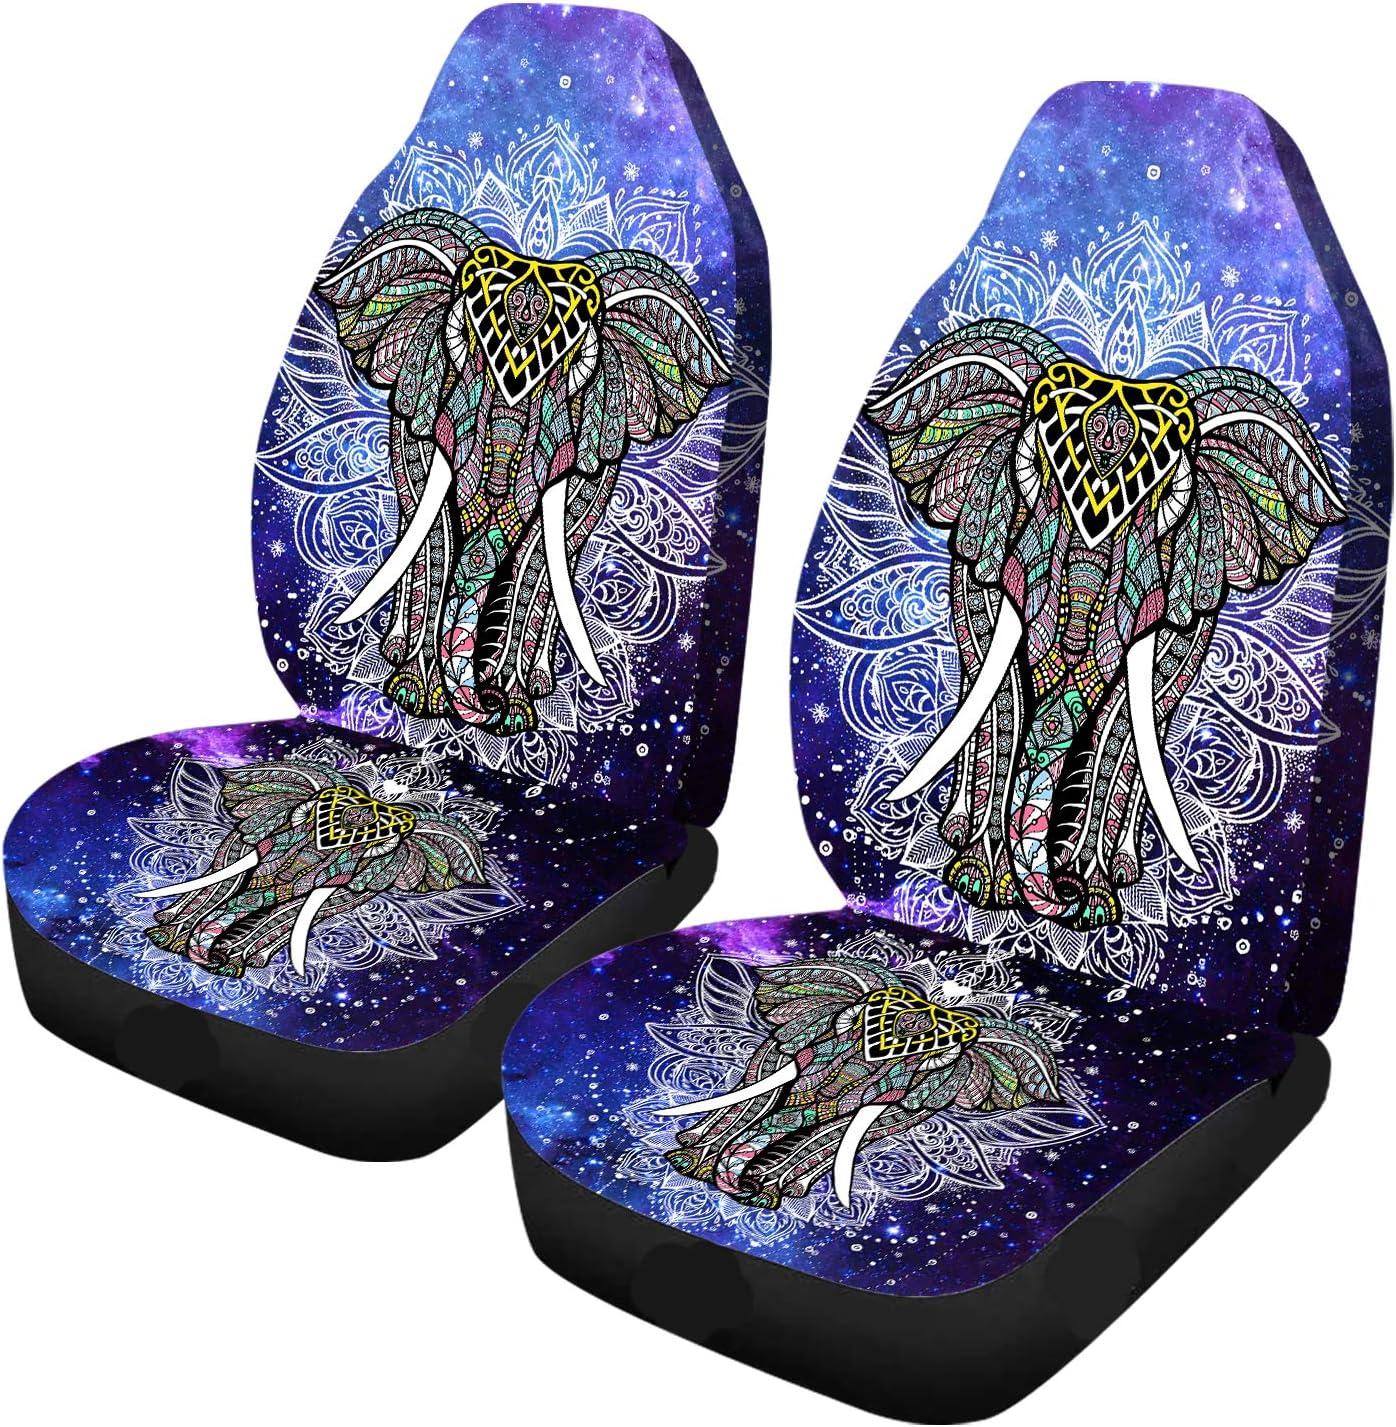 Car Seat Covers Colorful Ranking TOP18 Elephant Bohemia Galaxy Cheap SALE Start Geometric Manda